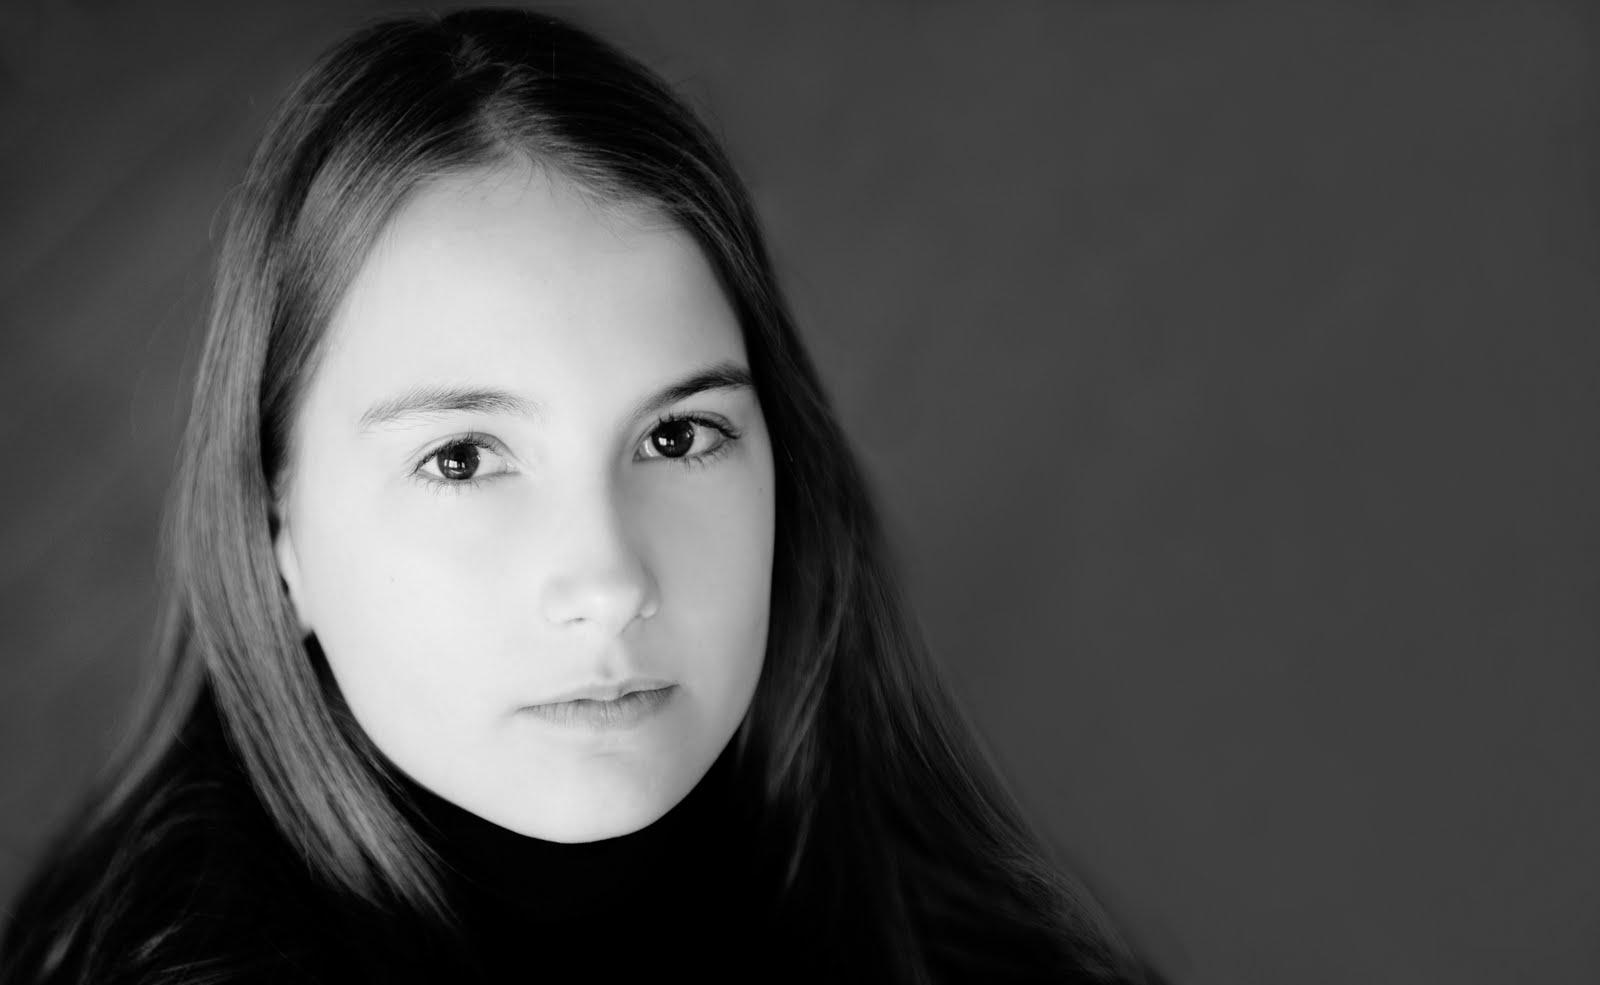 Lynn british movie auditions for girls teen